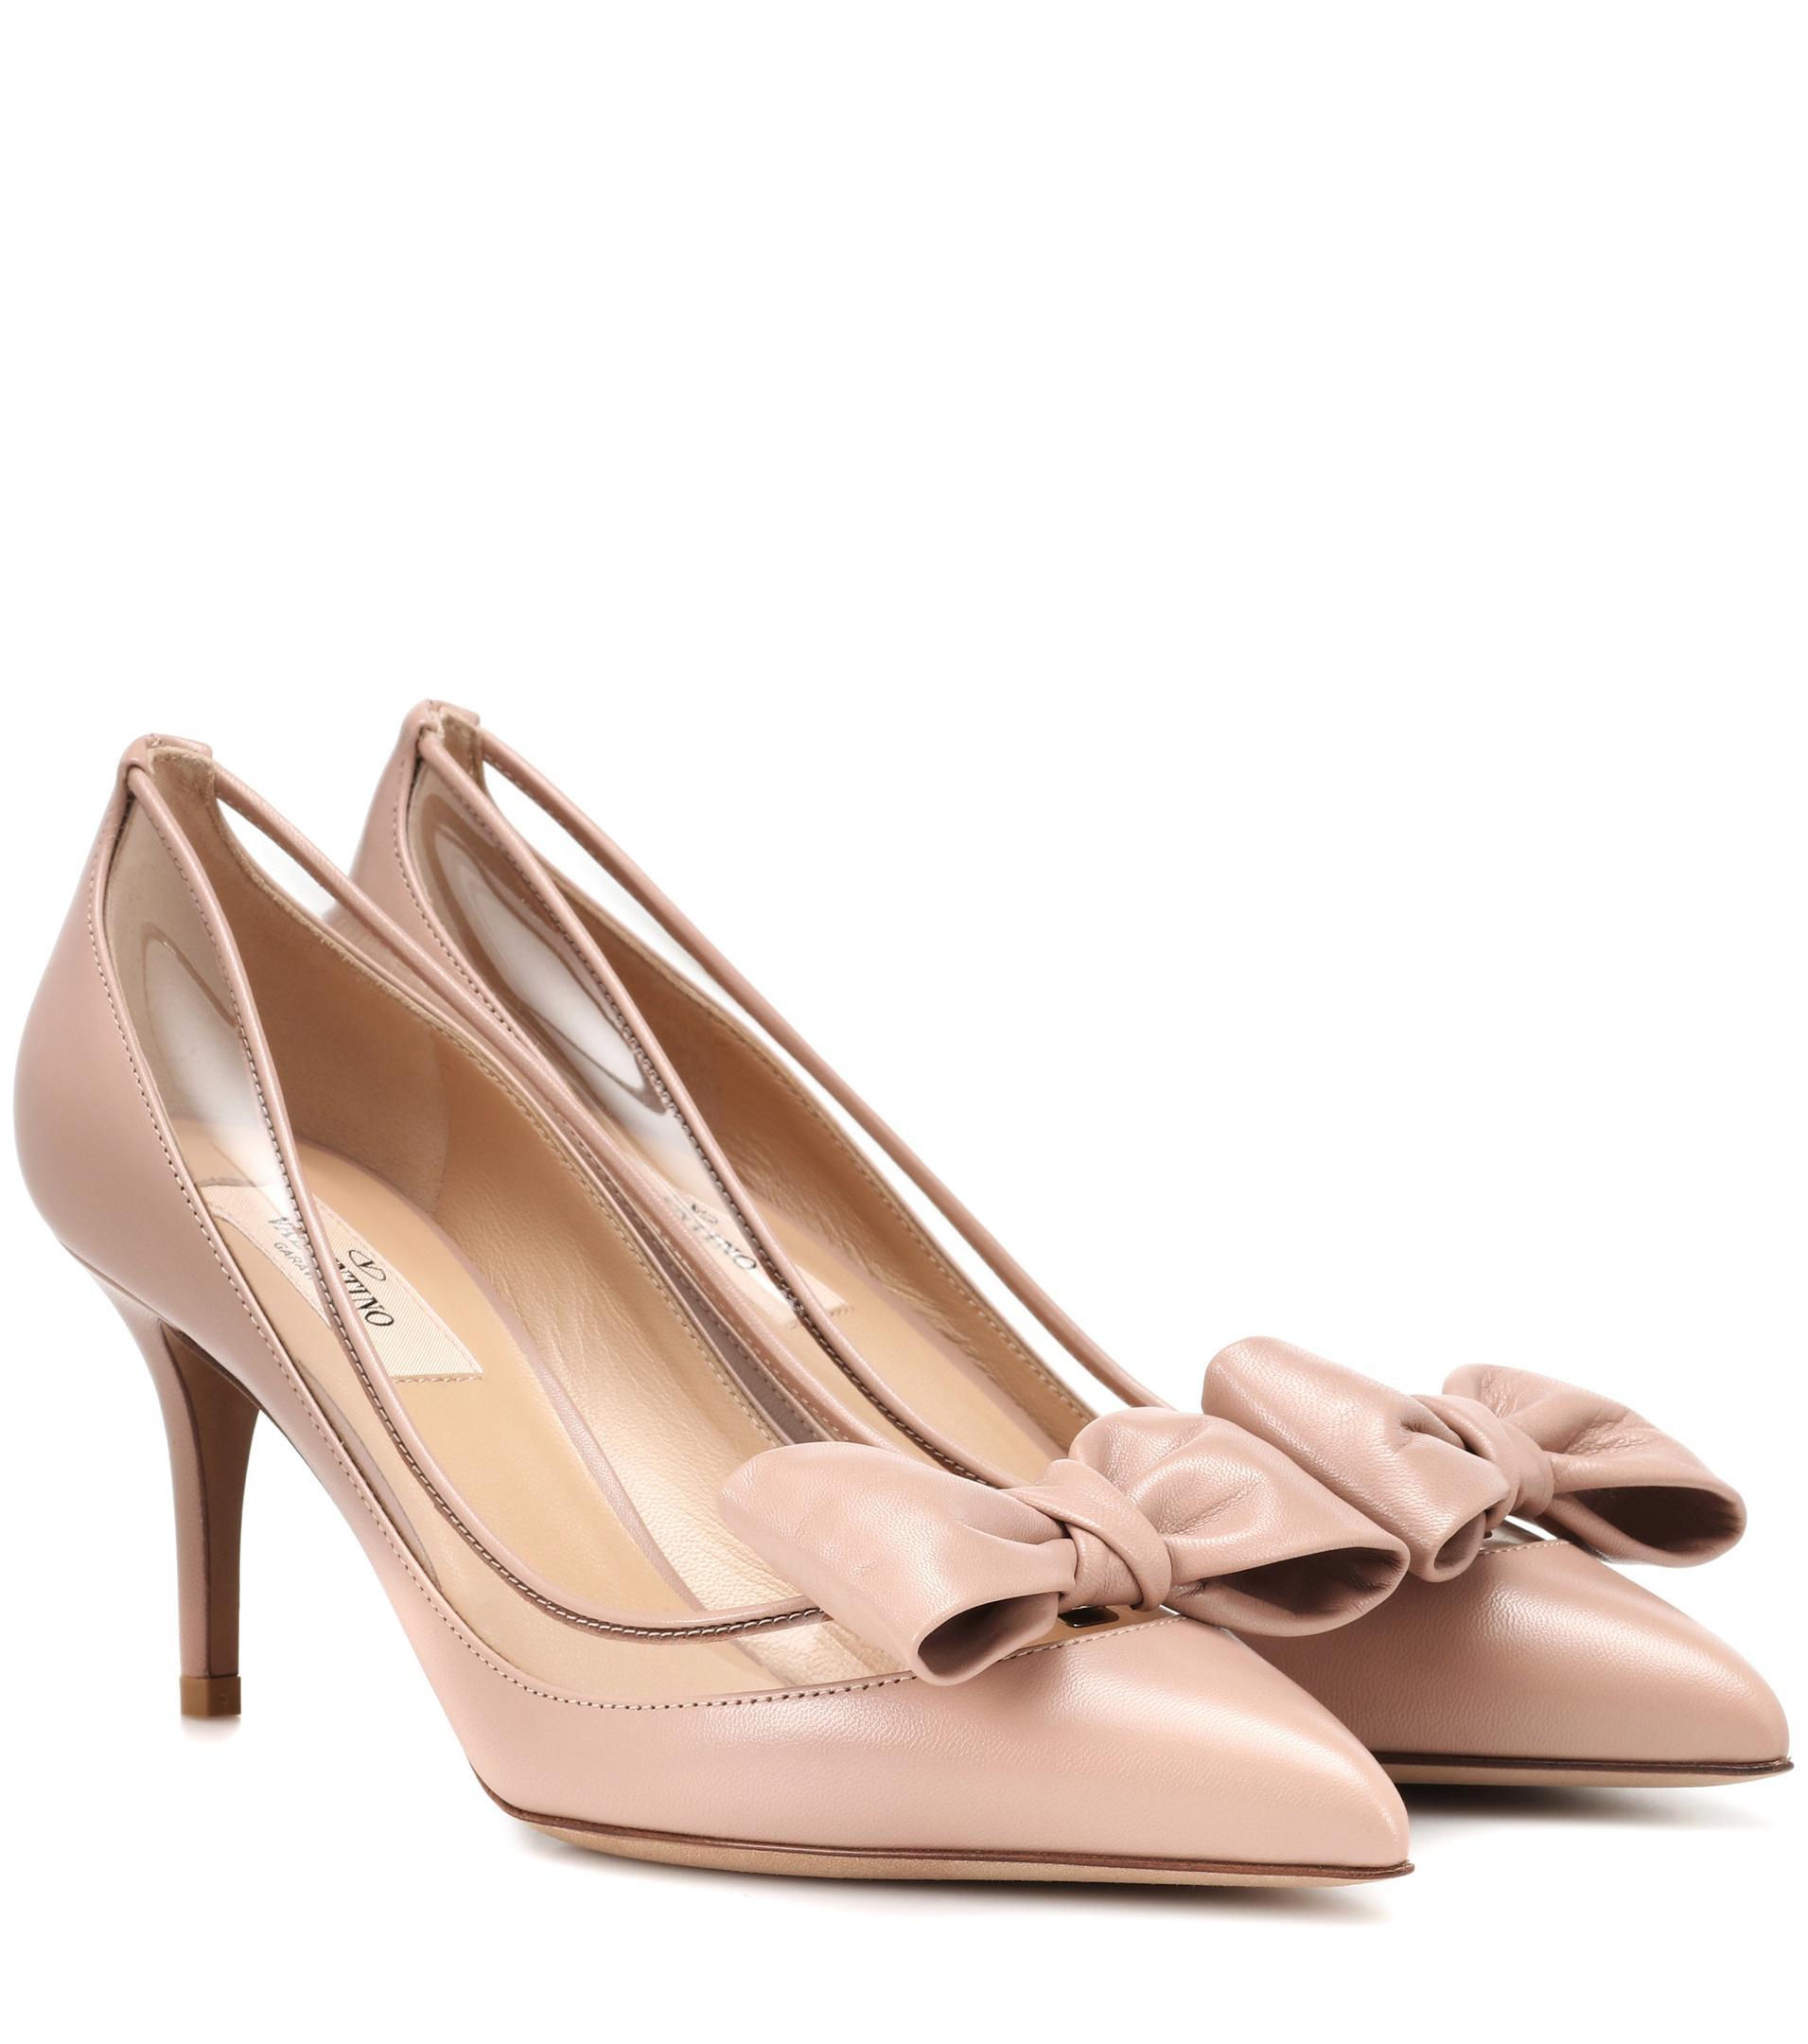 3c1d9431f0aa9b Lyst - - Escarpins en cuir Dollybow Valentino en coloris Rose